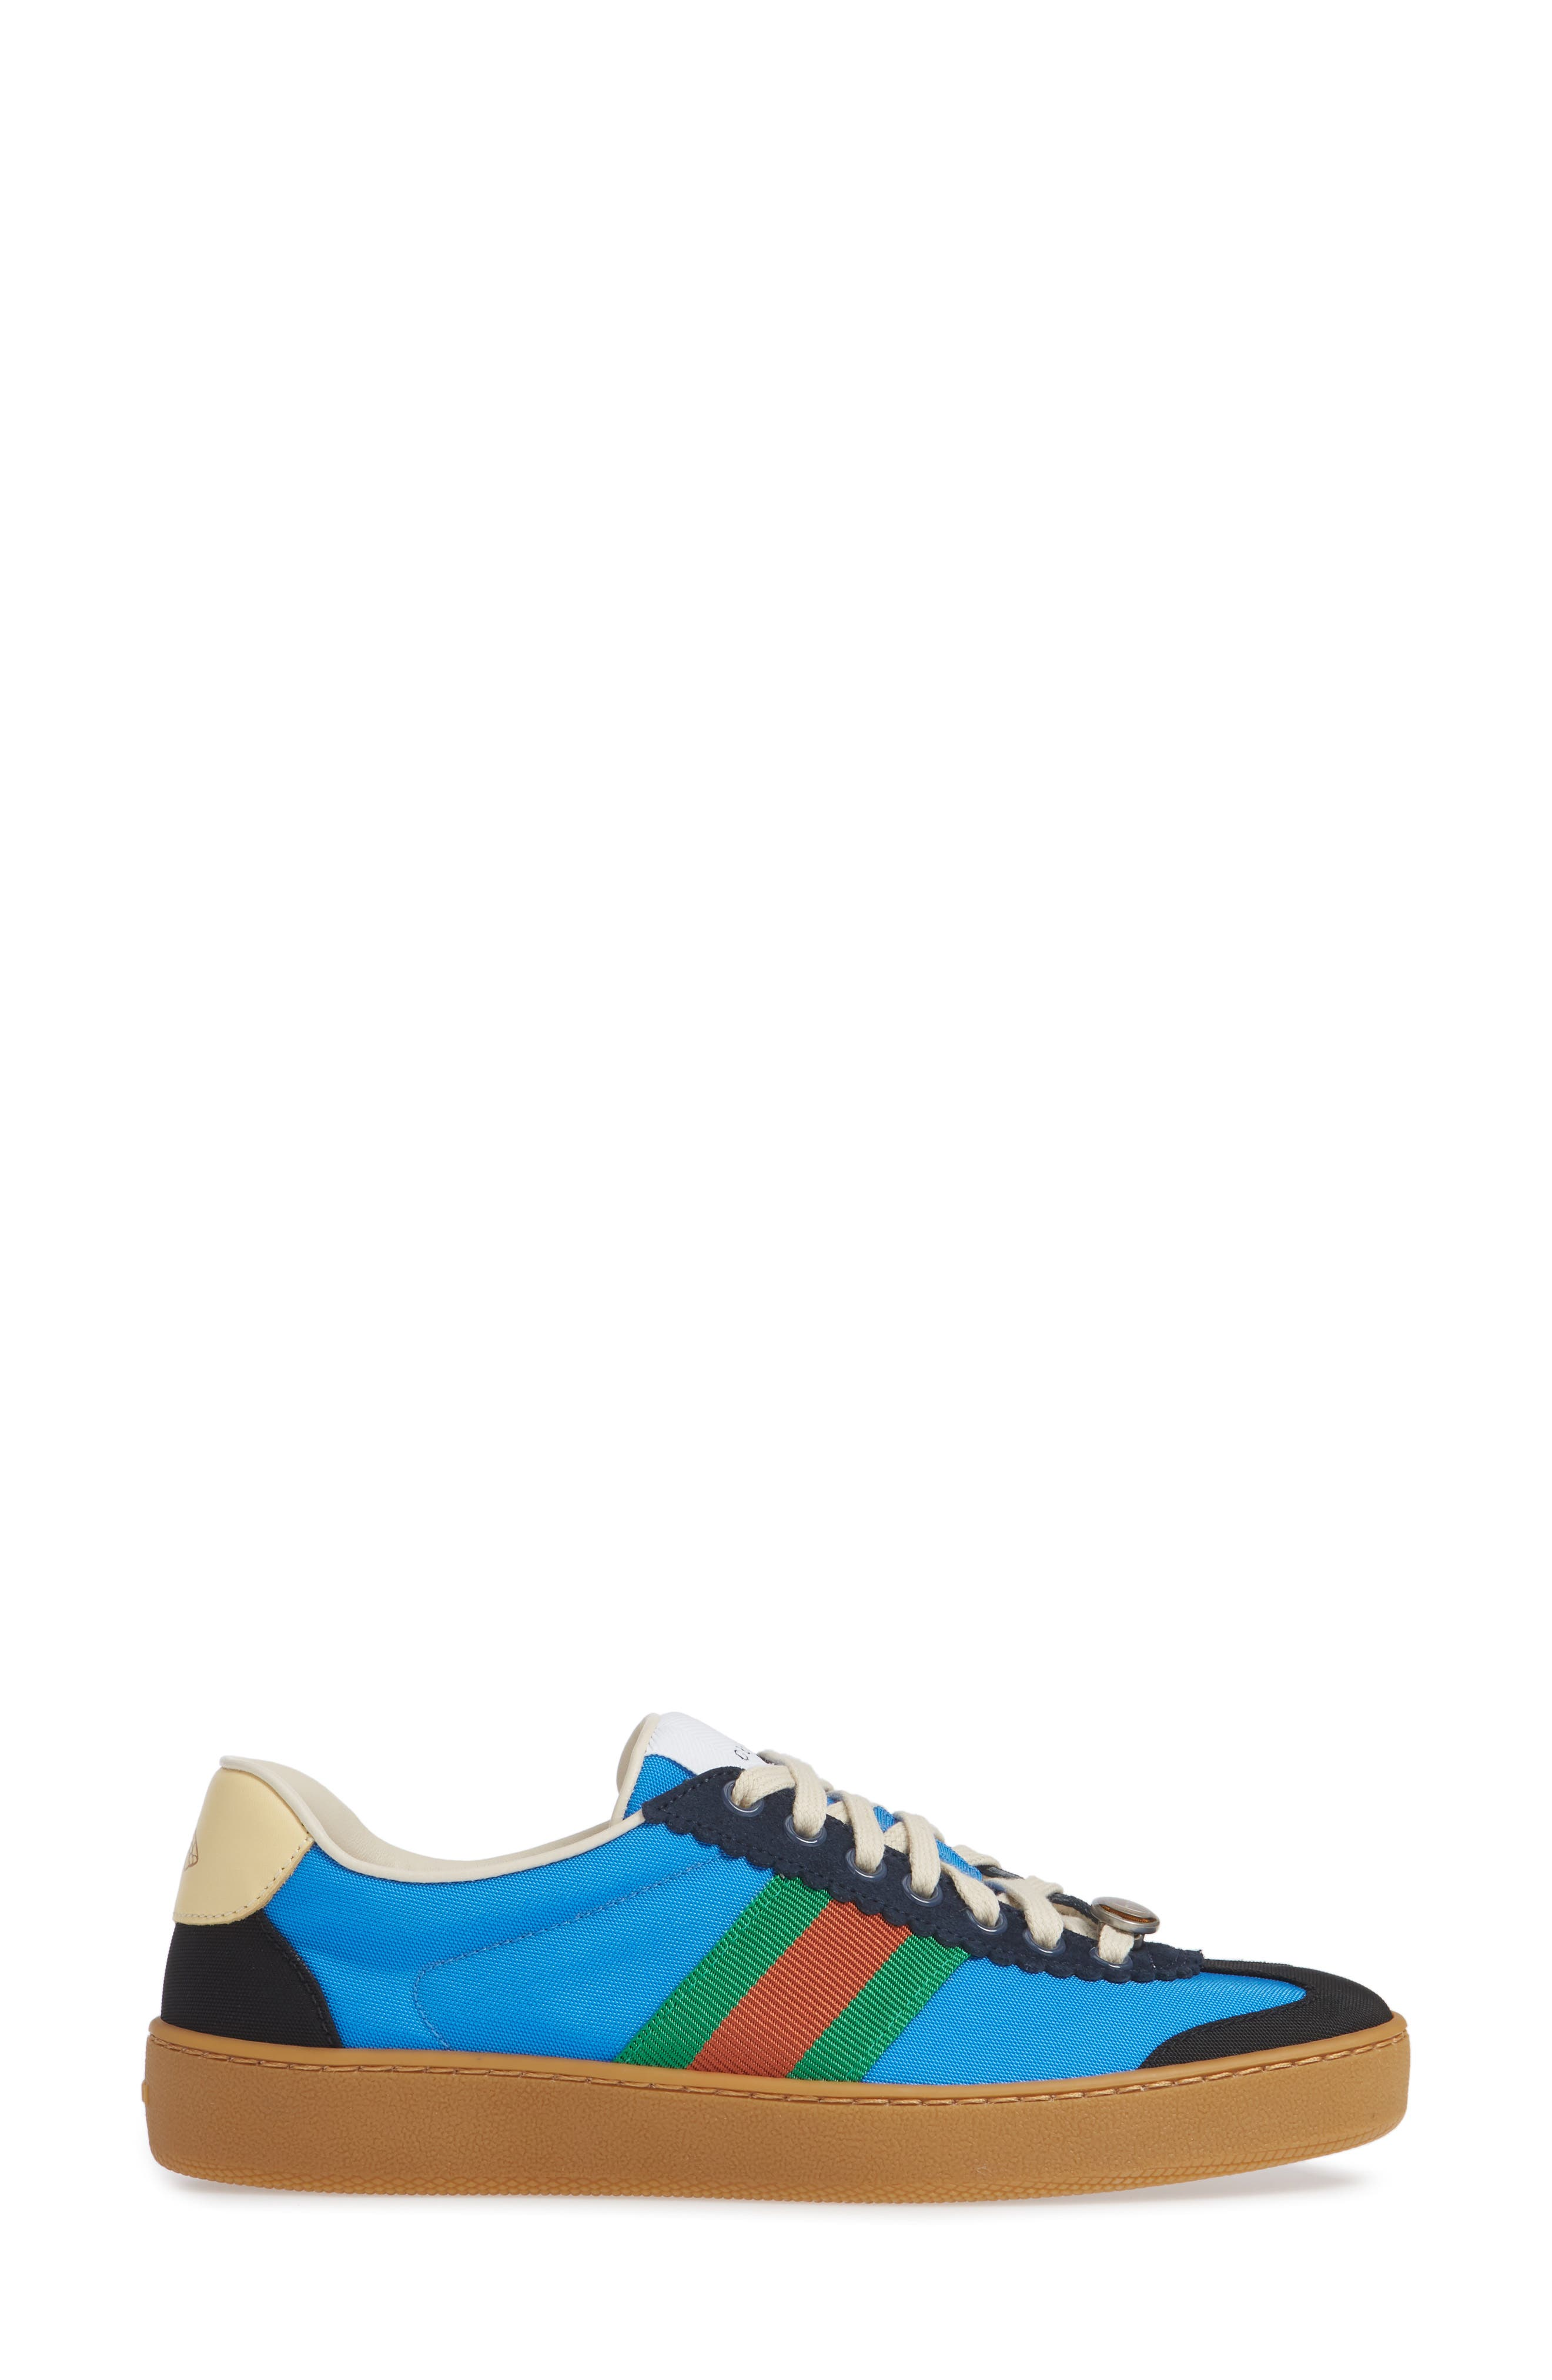 GUCCI, G74 Low Top Sneaker, Alternate thumbnail 3, color, 400